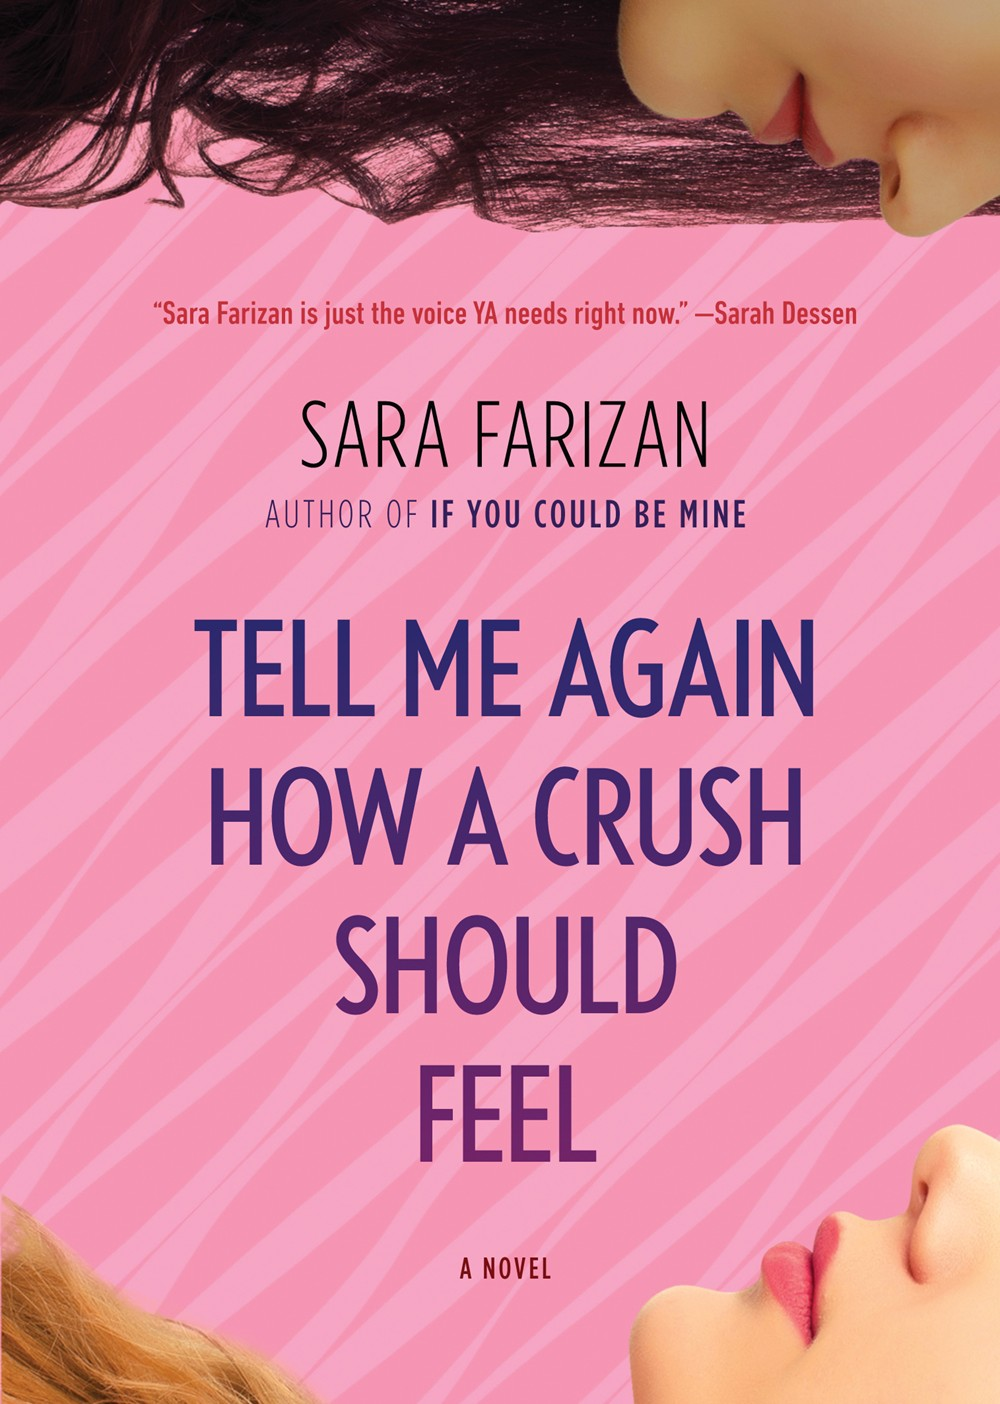 Tell Me Again How a Crush Should Feel , by Sara Farizan